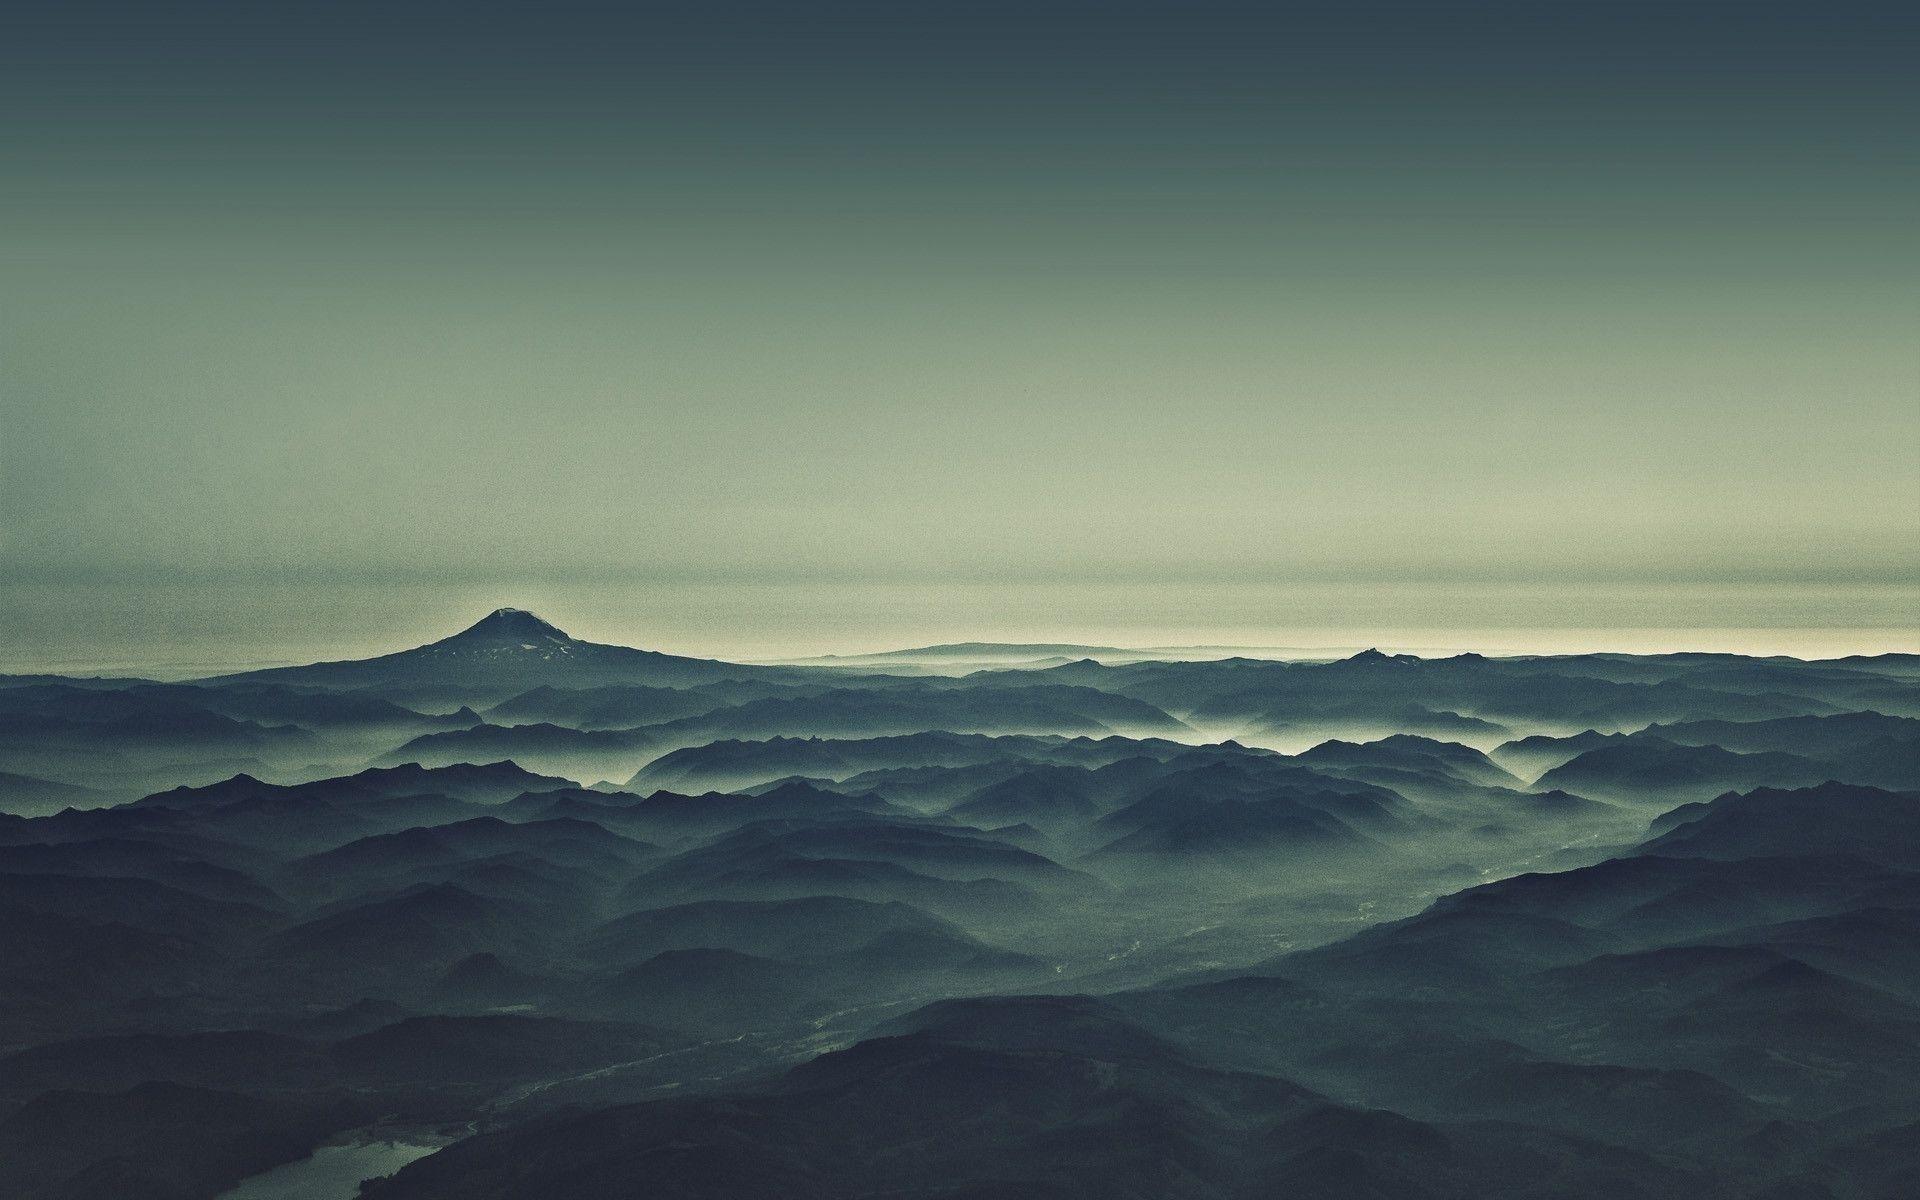 desktop wallpaper tumblr,sky,blue,mountainous landforms,horizon,mountain